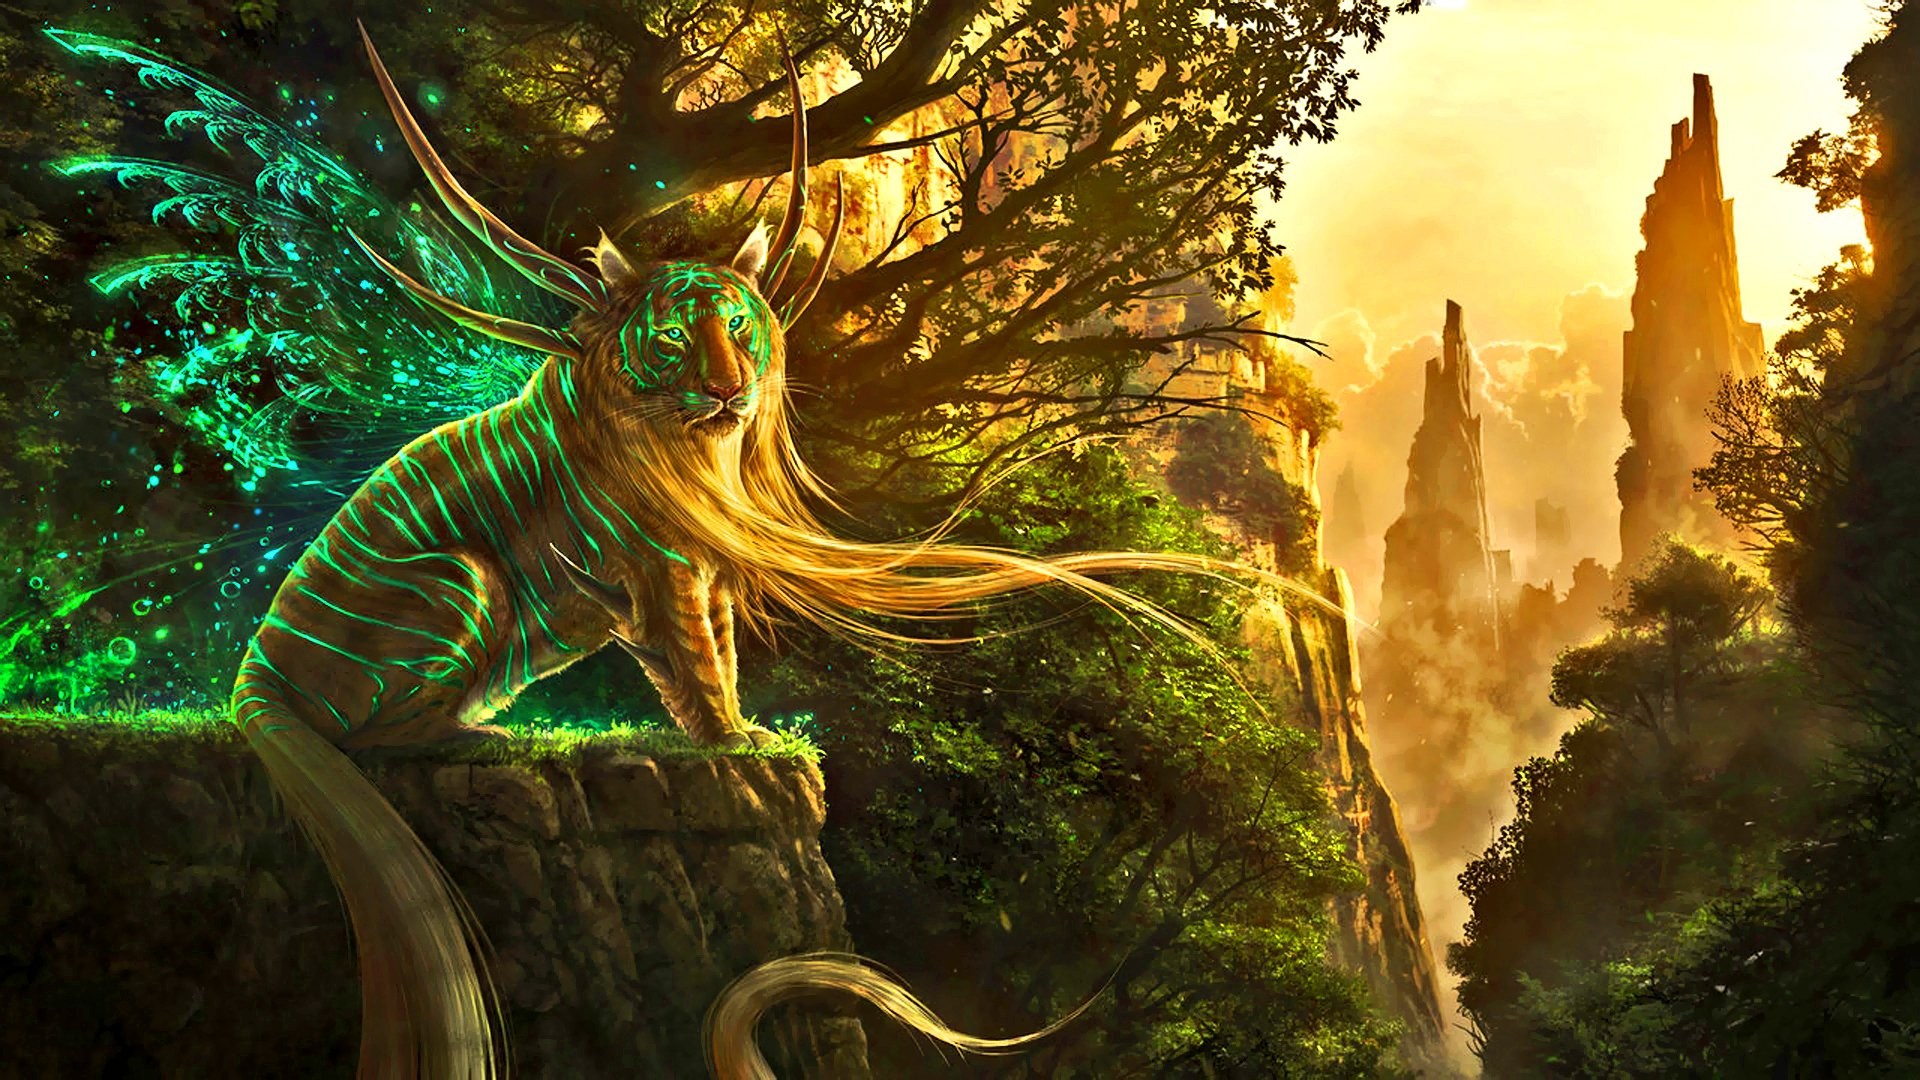 Fantasy Tiger Hd Desktop Wallpapers Widescreen High: RIFT Fantasy Rpg Tiger Wallpaper